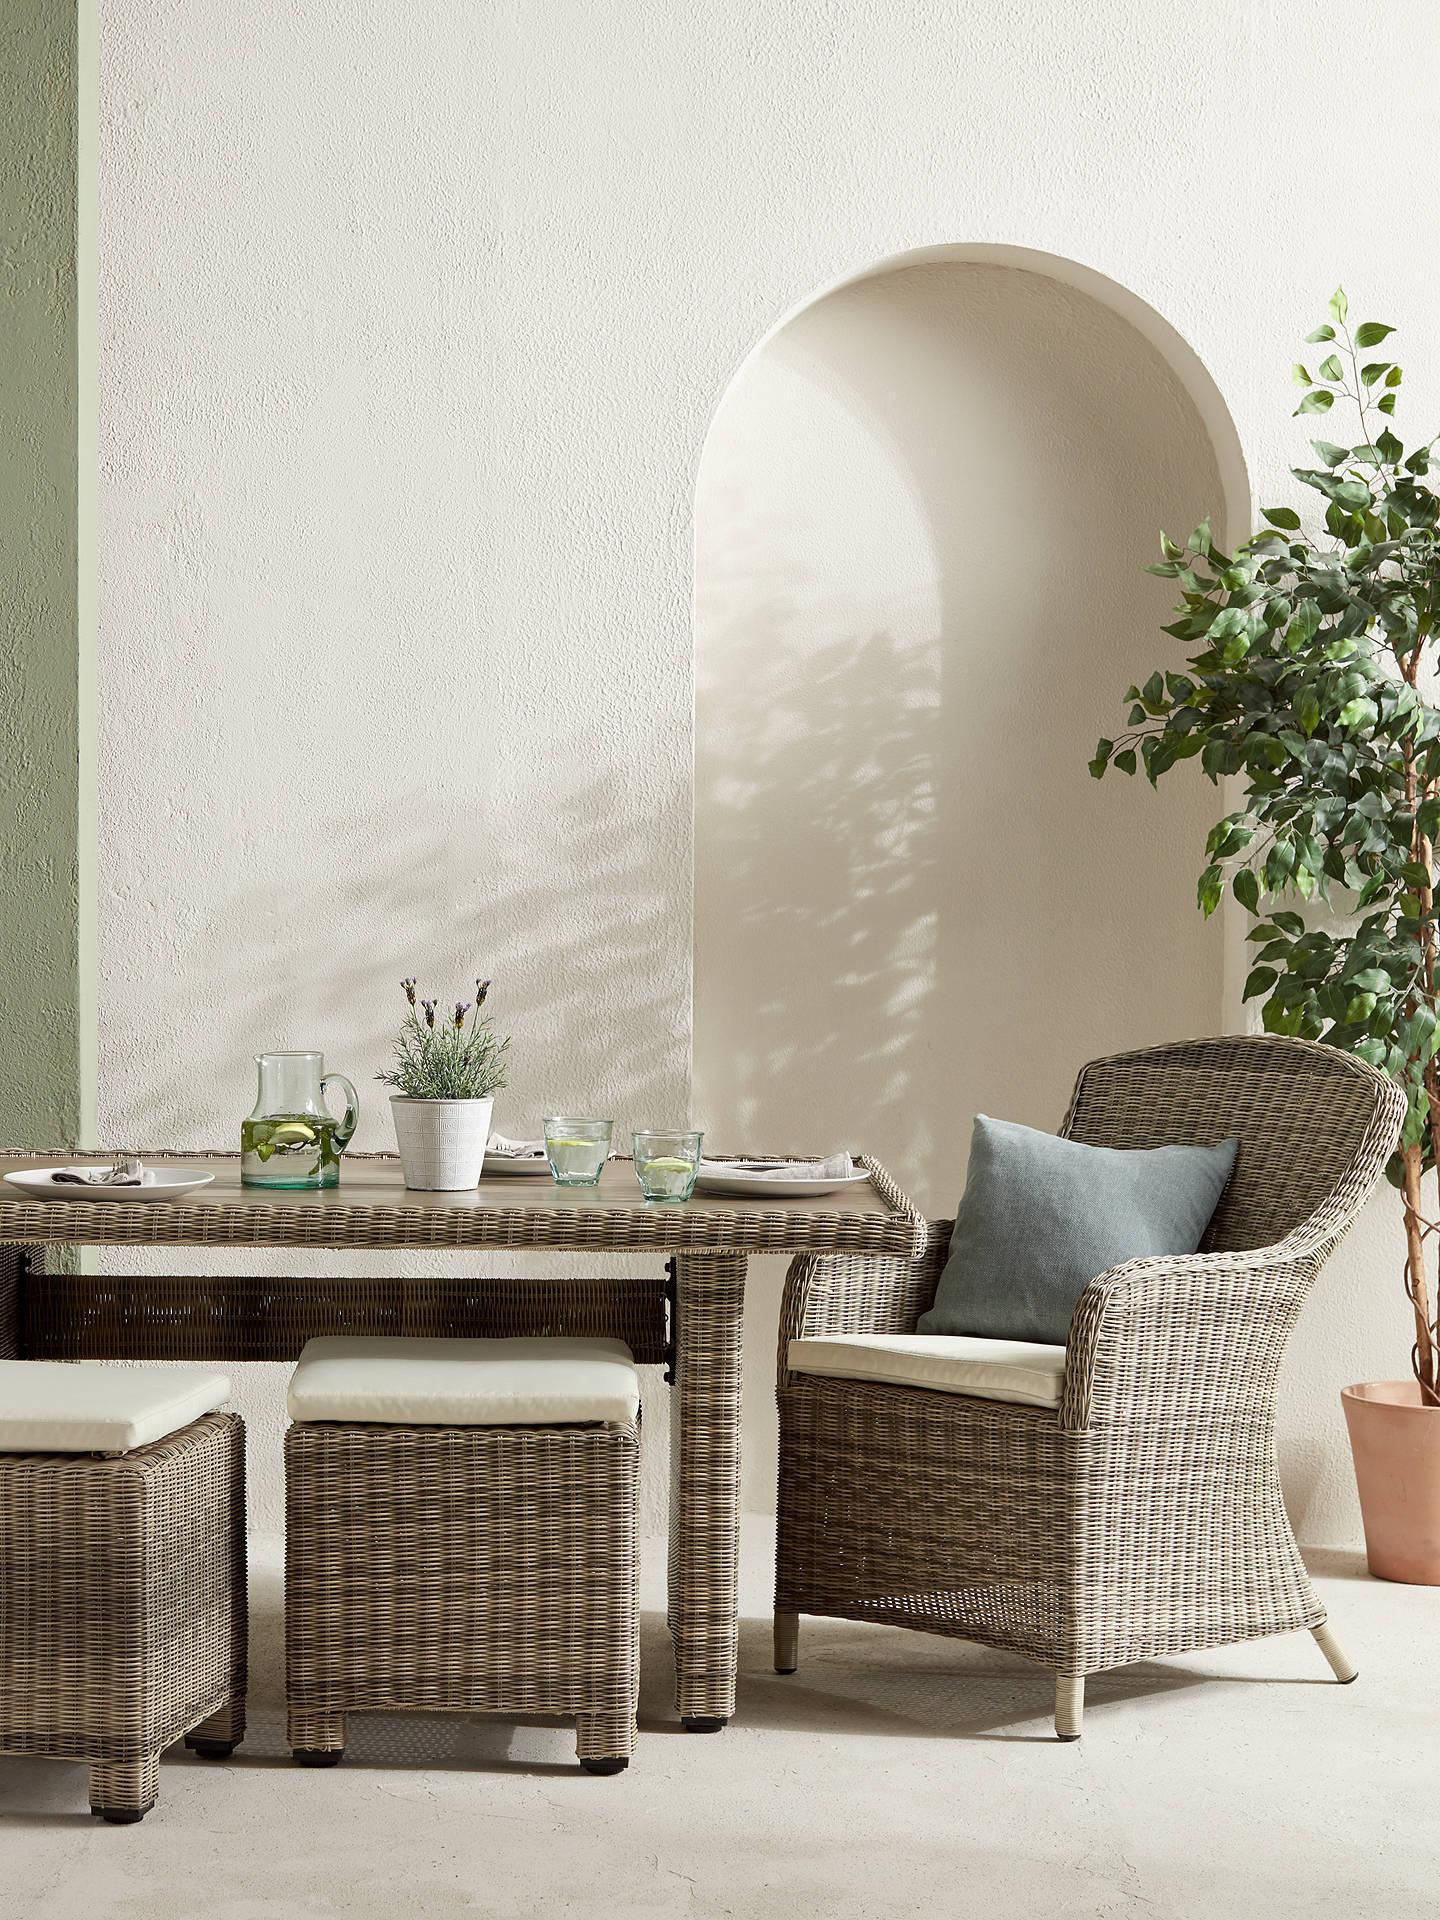 Buyjohn lewis partners dante deluxe outdoor dining armchair set of 2 natural online